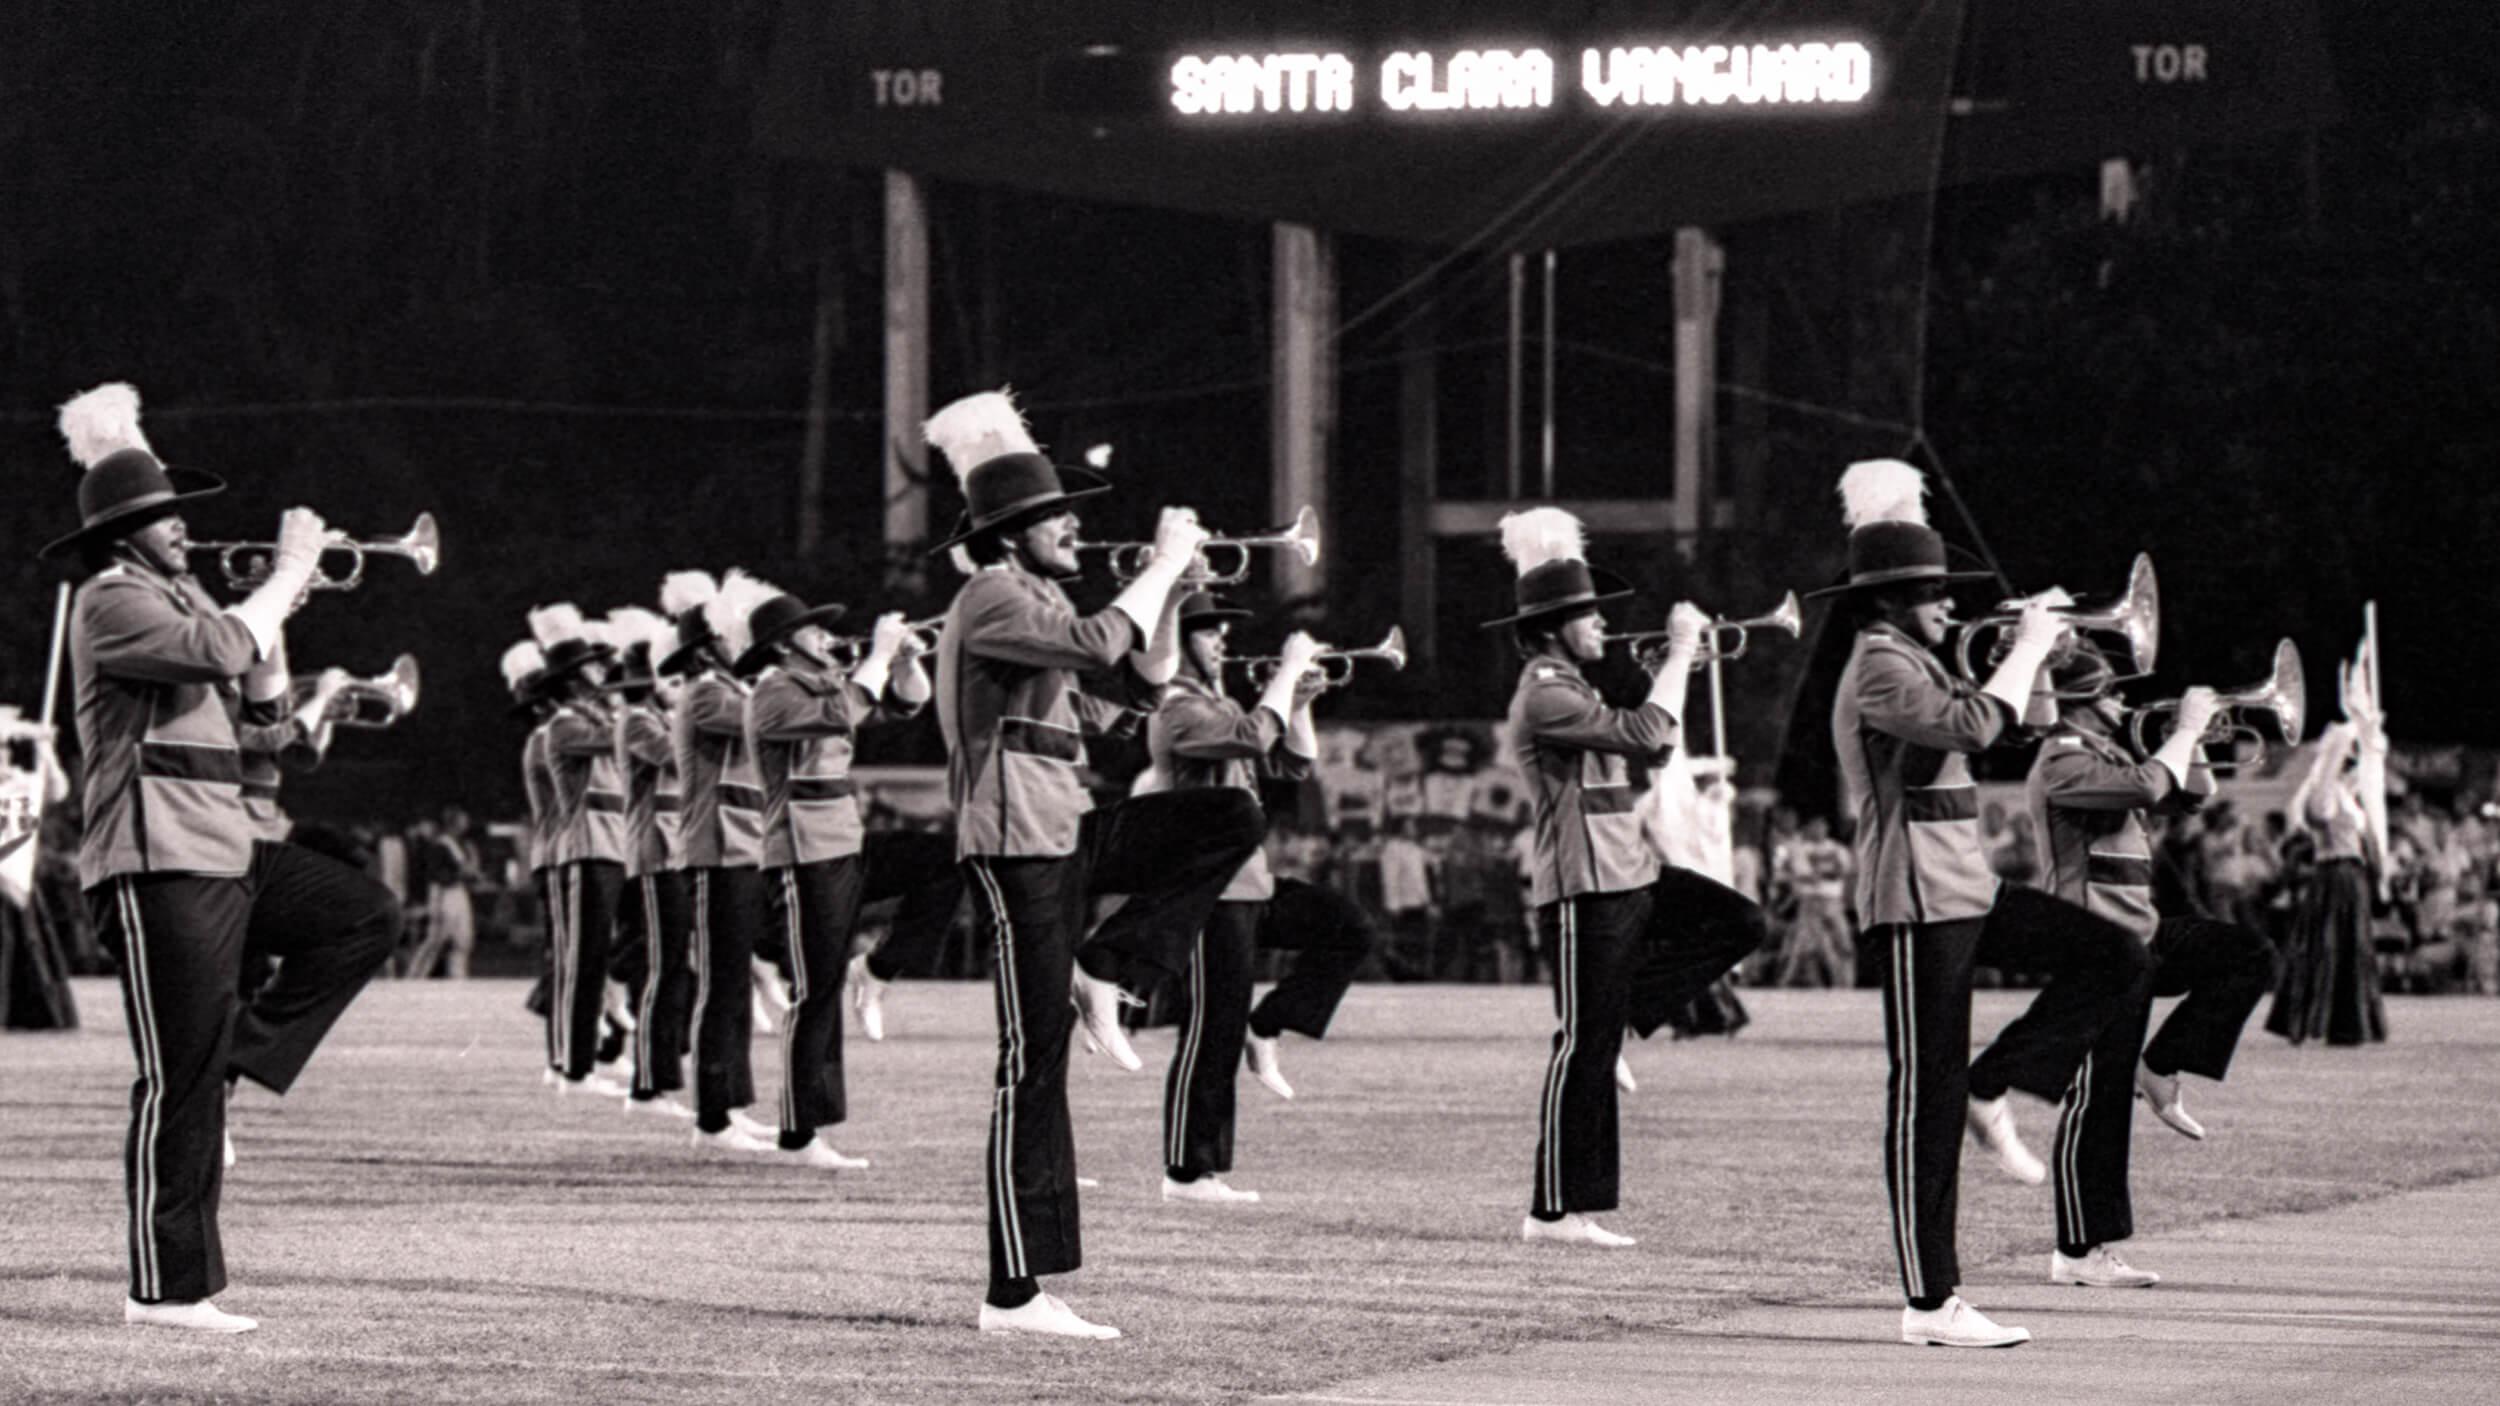 1983 Santa Clara Vanguard